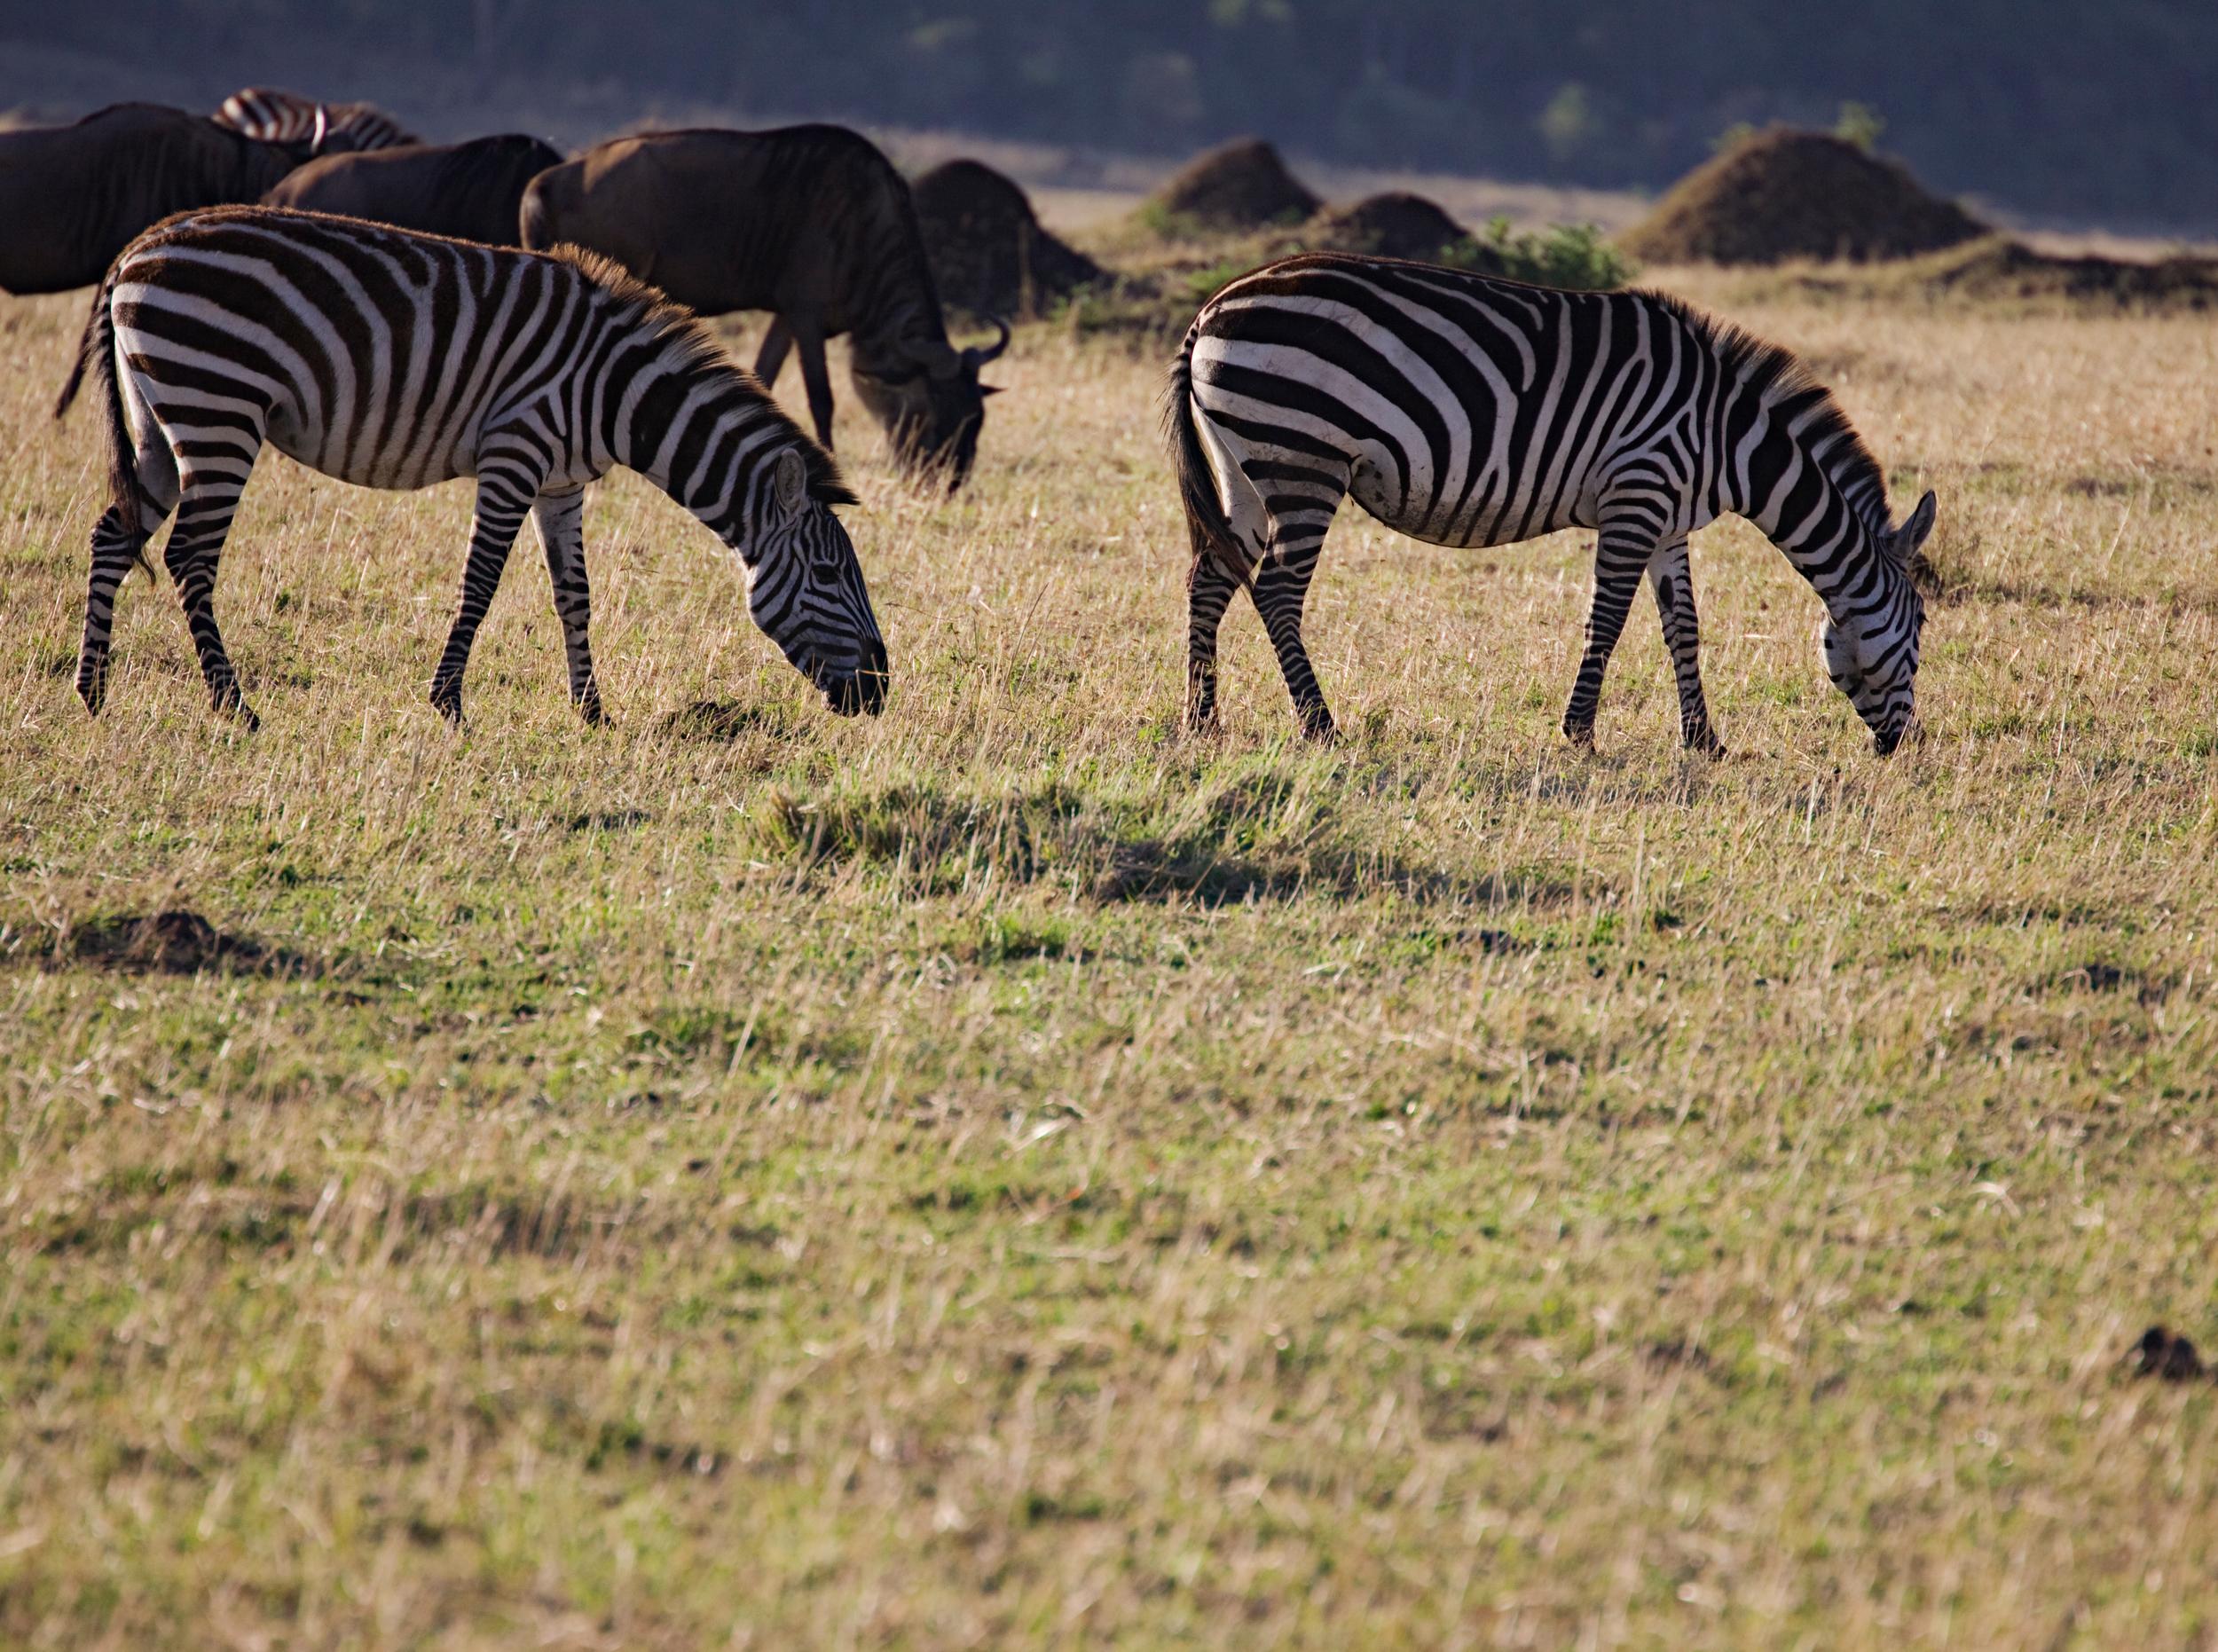 Common Zebras, Wildebeast, Masai Mara